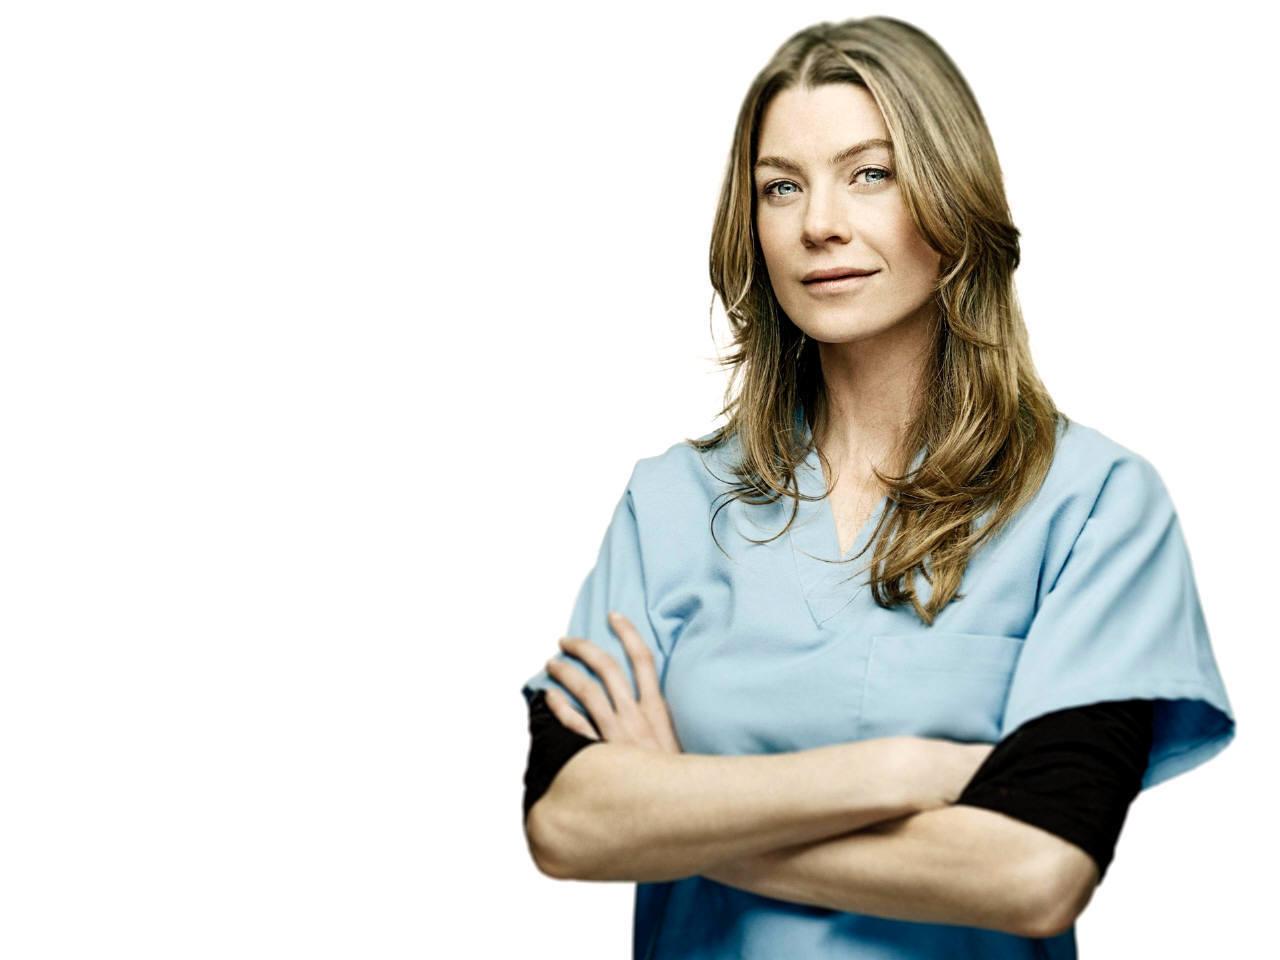 GreyS Anatomy Ellen Pompeo